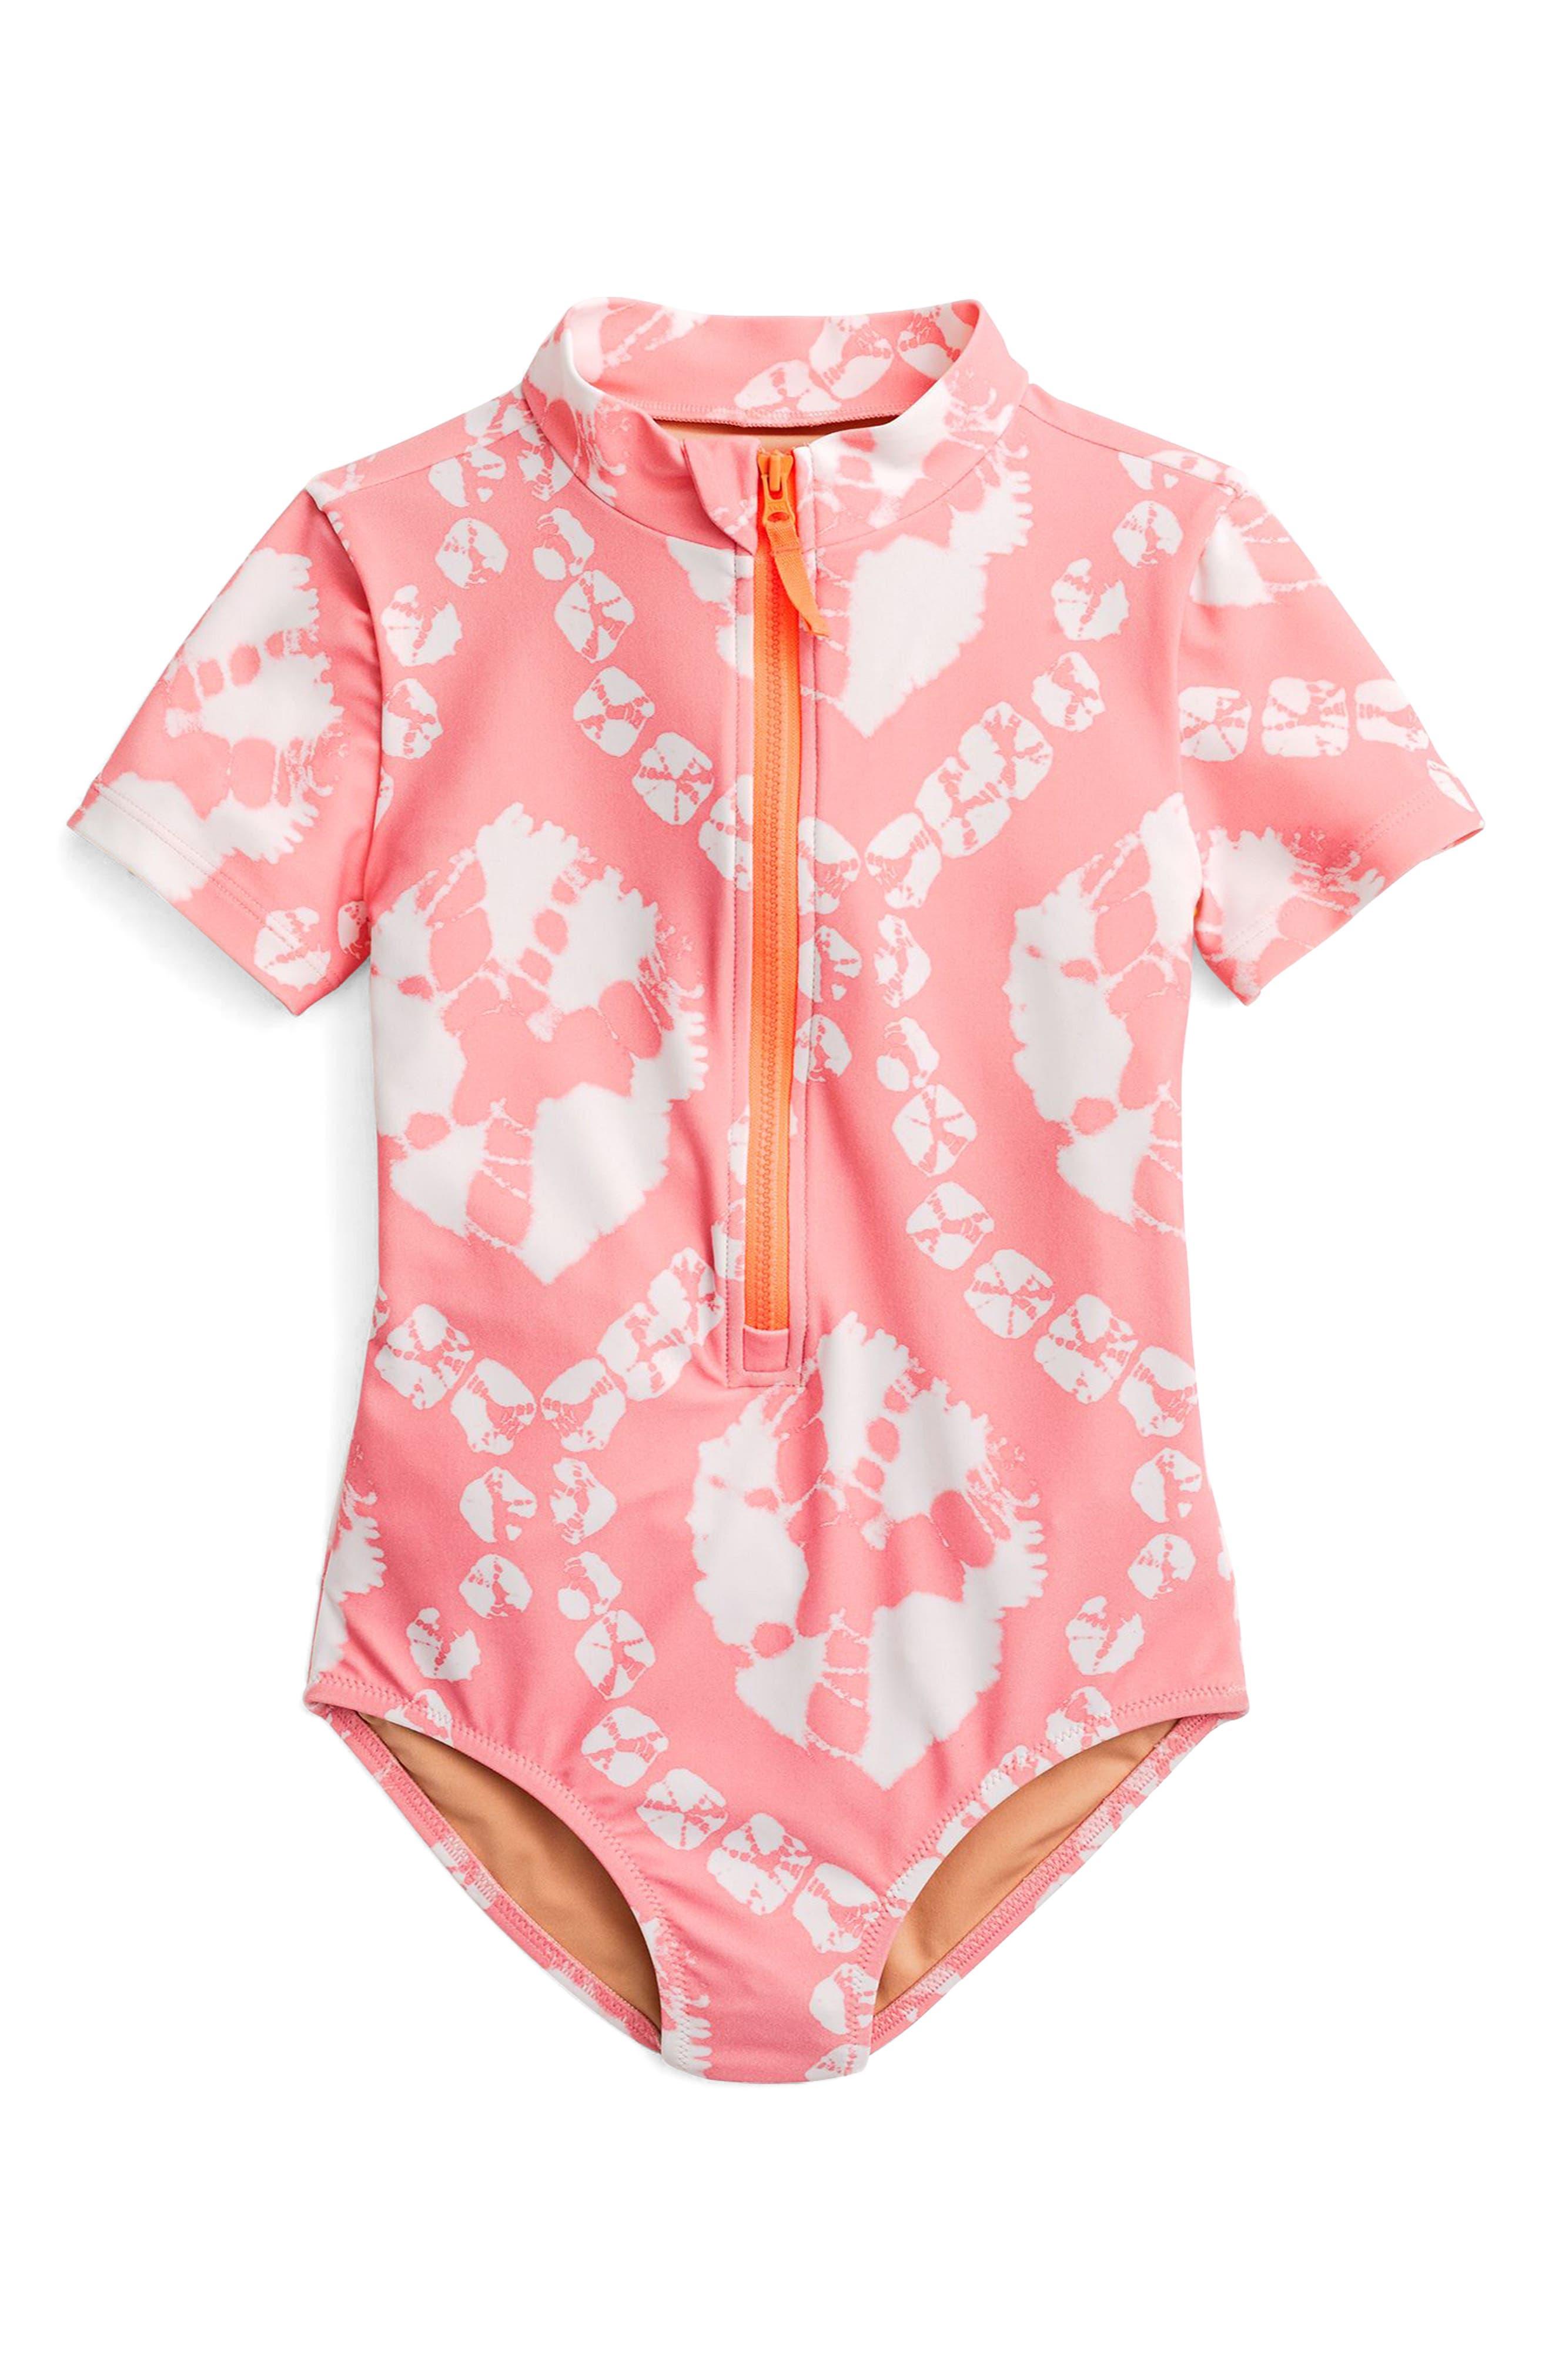 Tie Dye One-Piece Rashguard Swimsuit,                         Main,                         color, 651